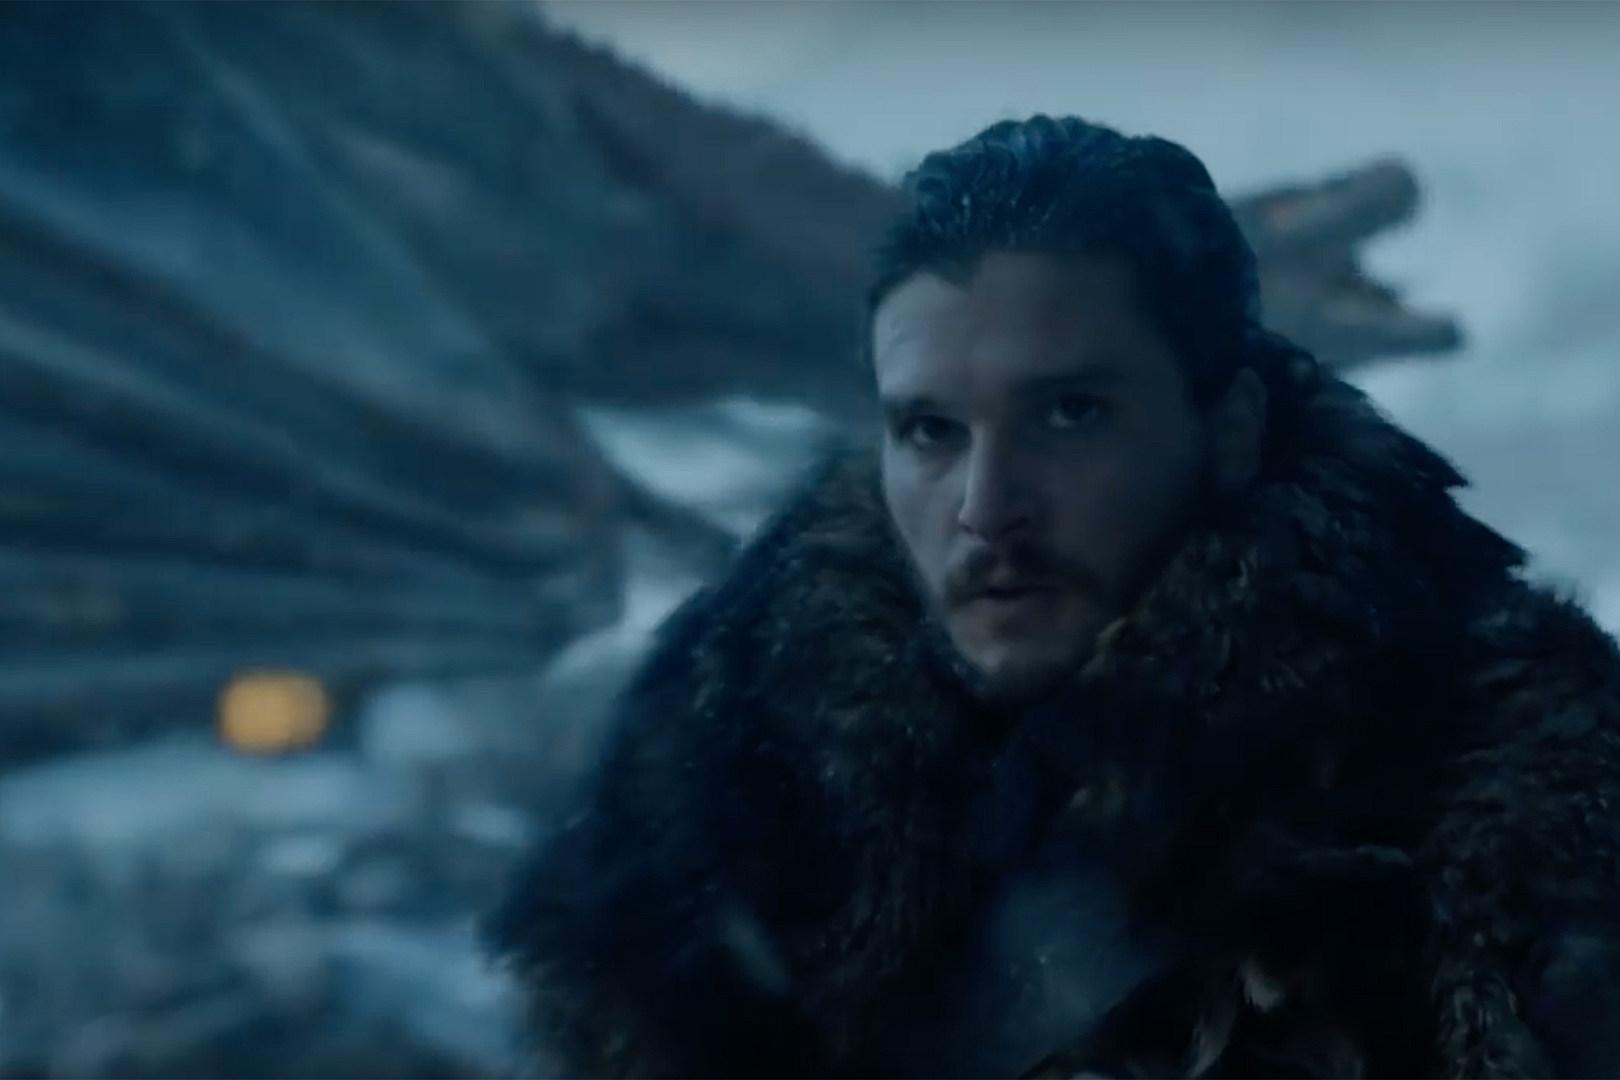 Final 'Game of Thrones' Season Announced